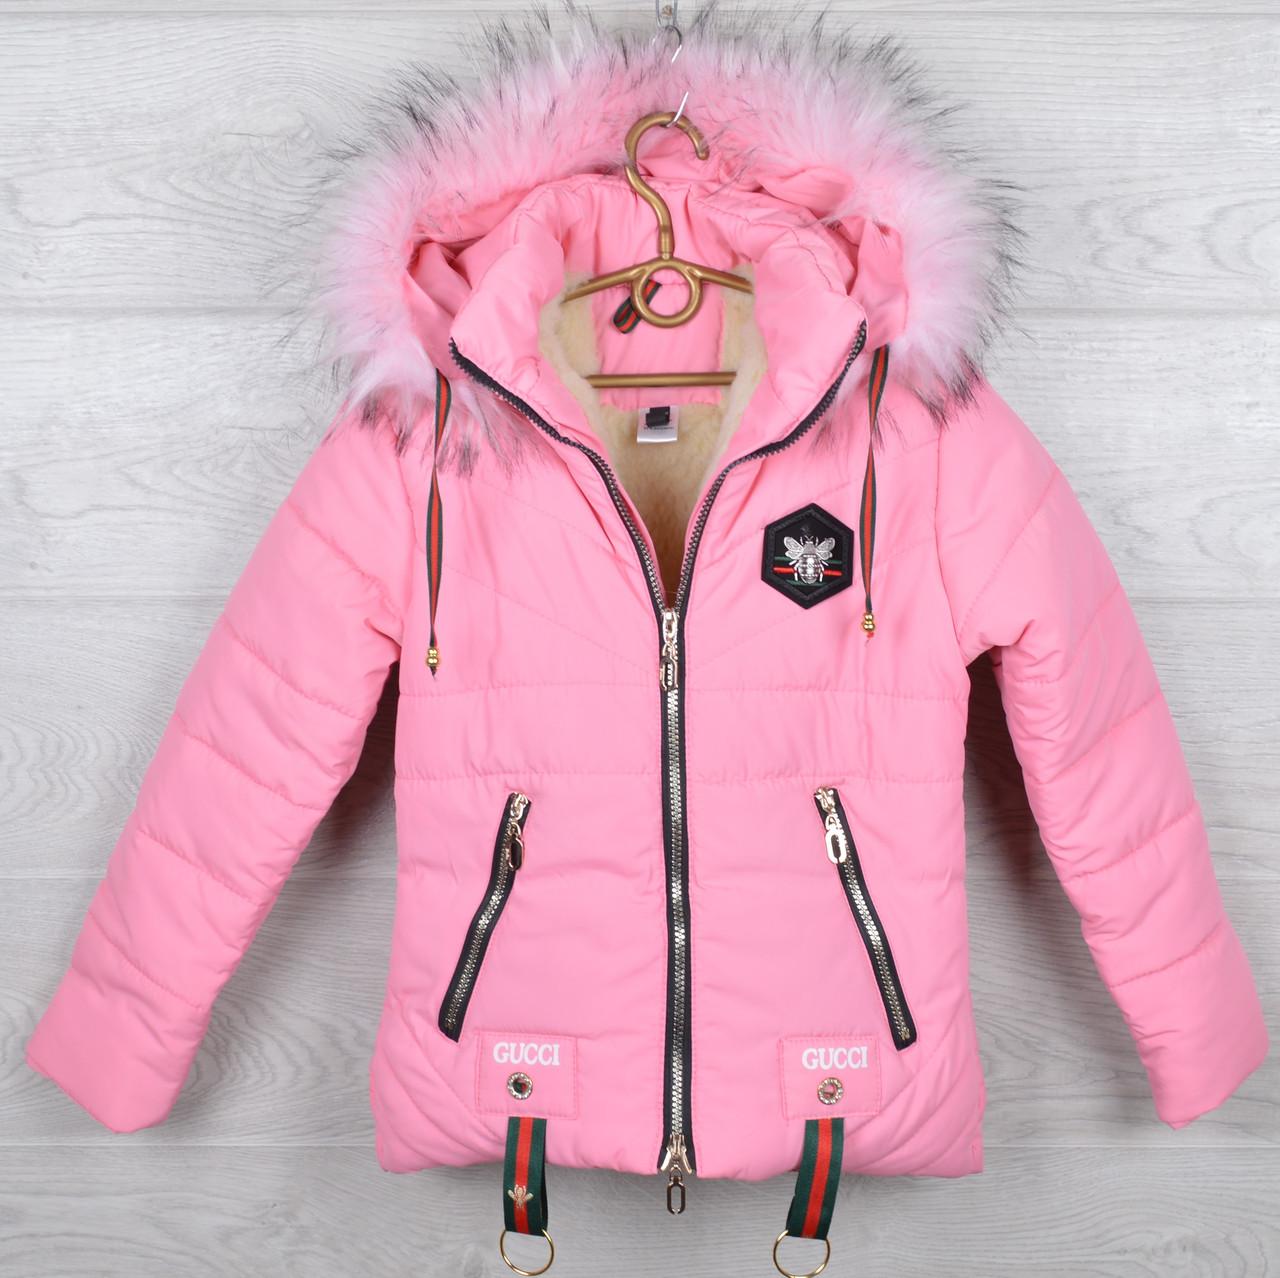 bfe18129c2f0 Куртка зимняя